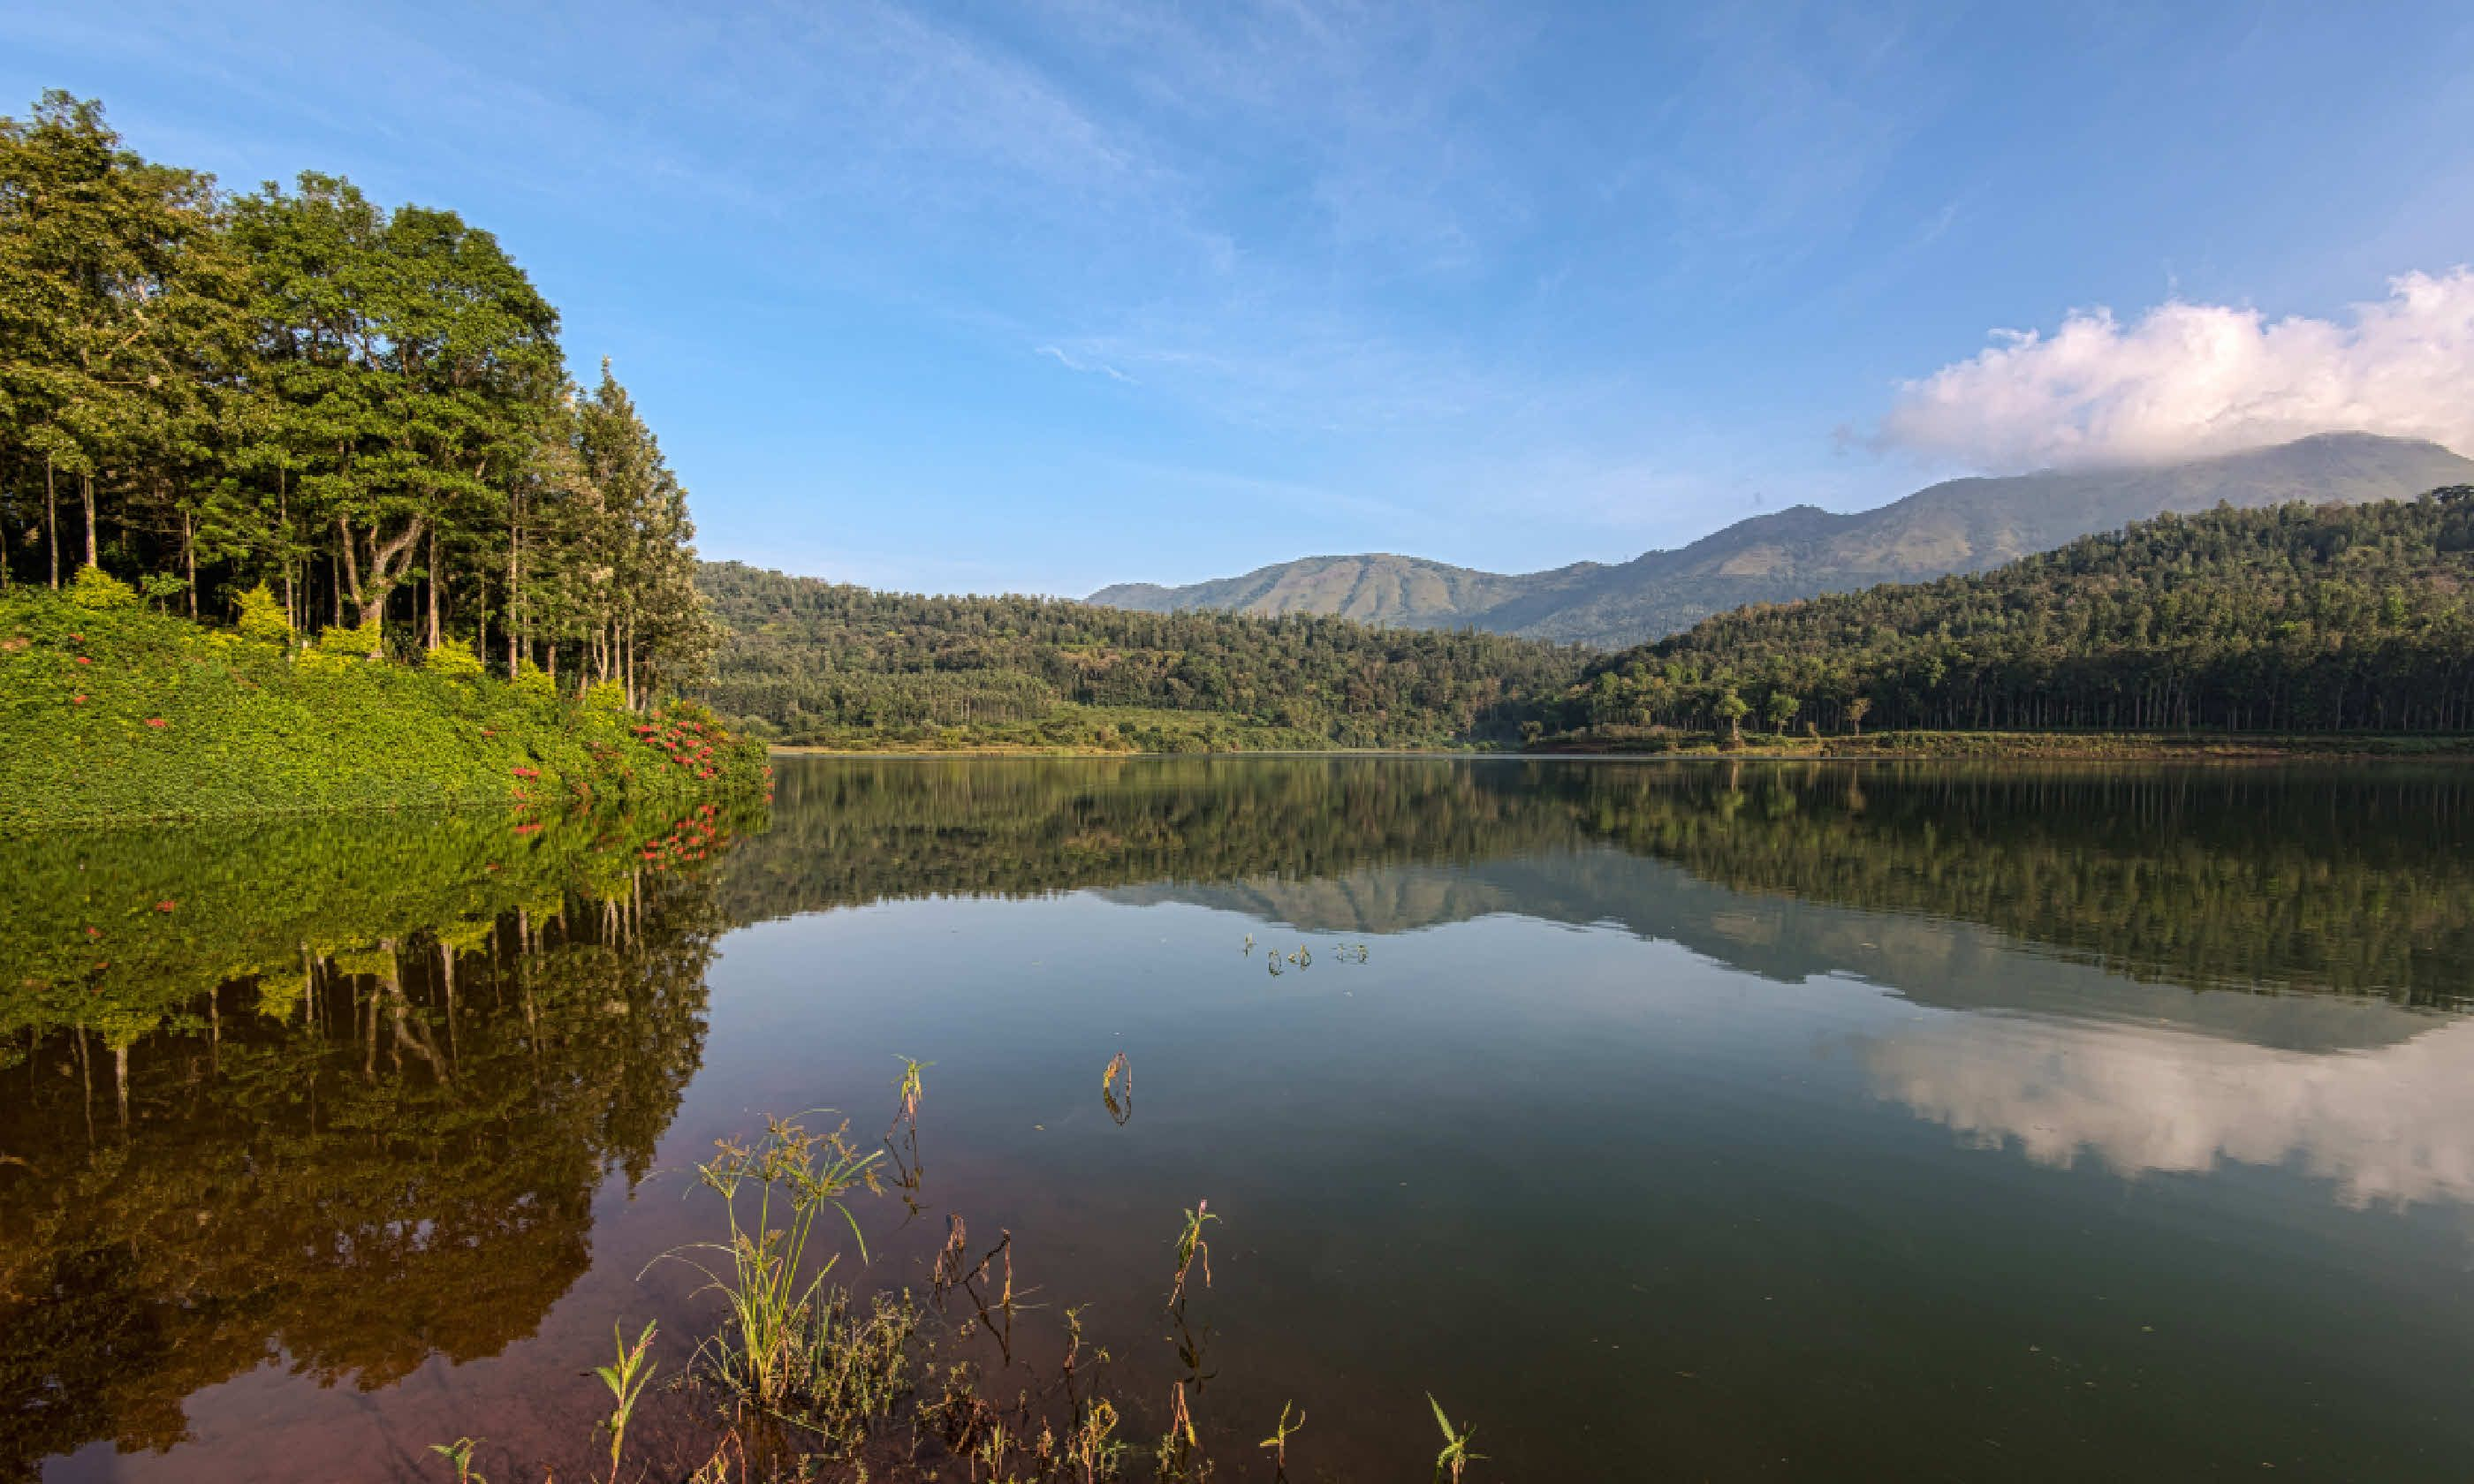 Hirekolale lake, near Chikmagalur, Karnataka (Shutterstock)